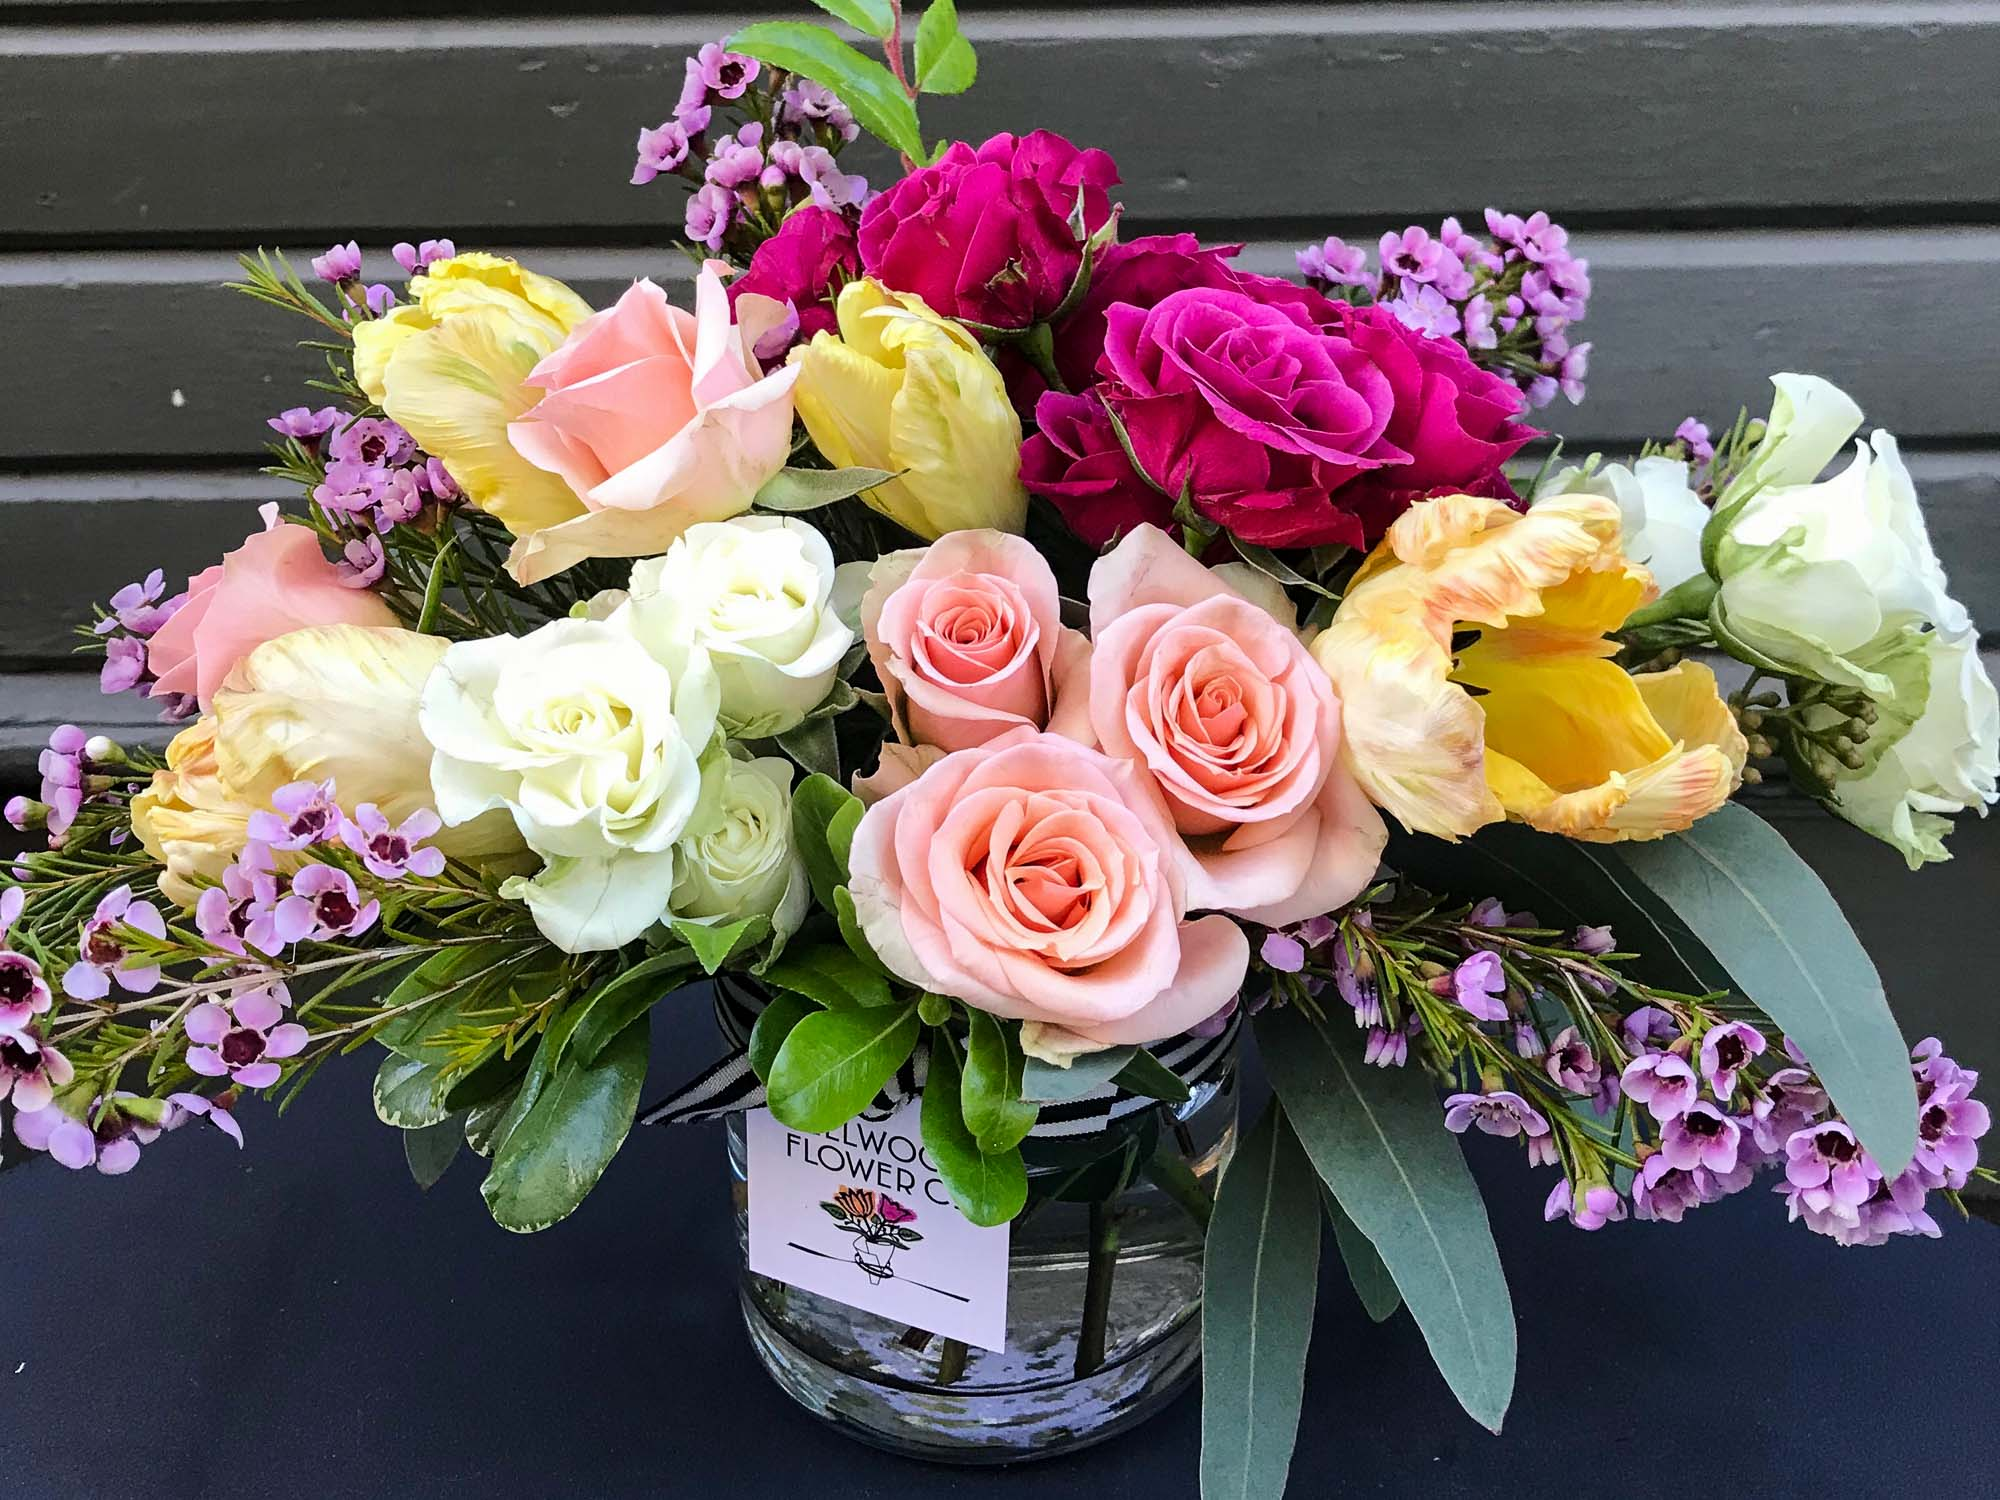 visit-sellwood-moreland-business-alliance_sellwood-flower-company-7.jpg